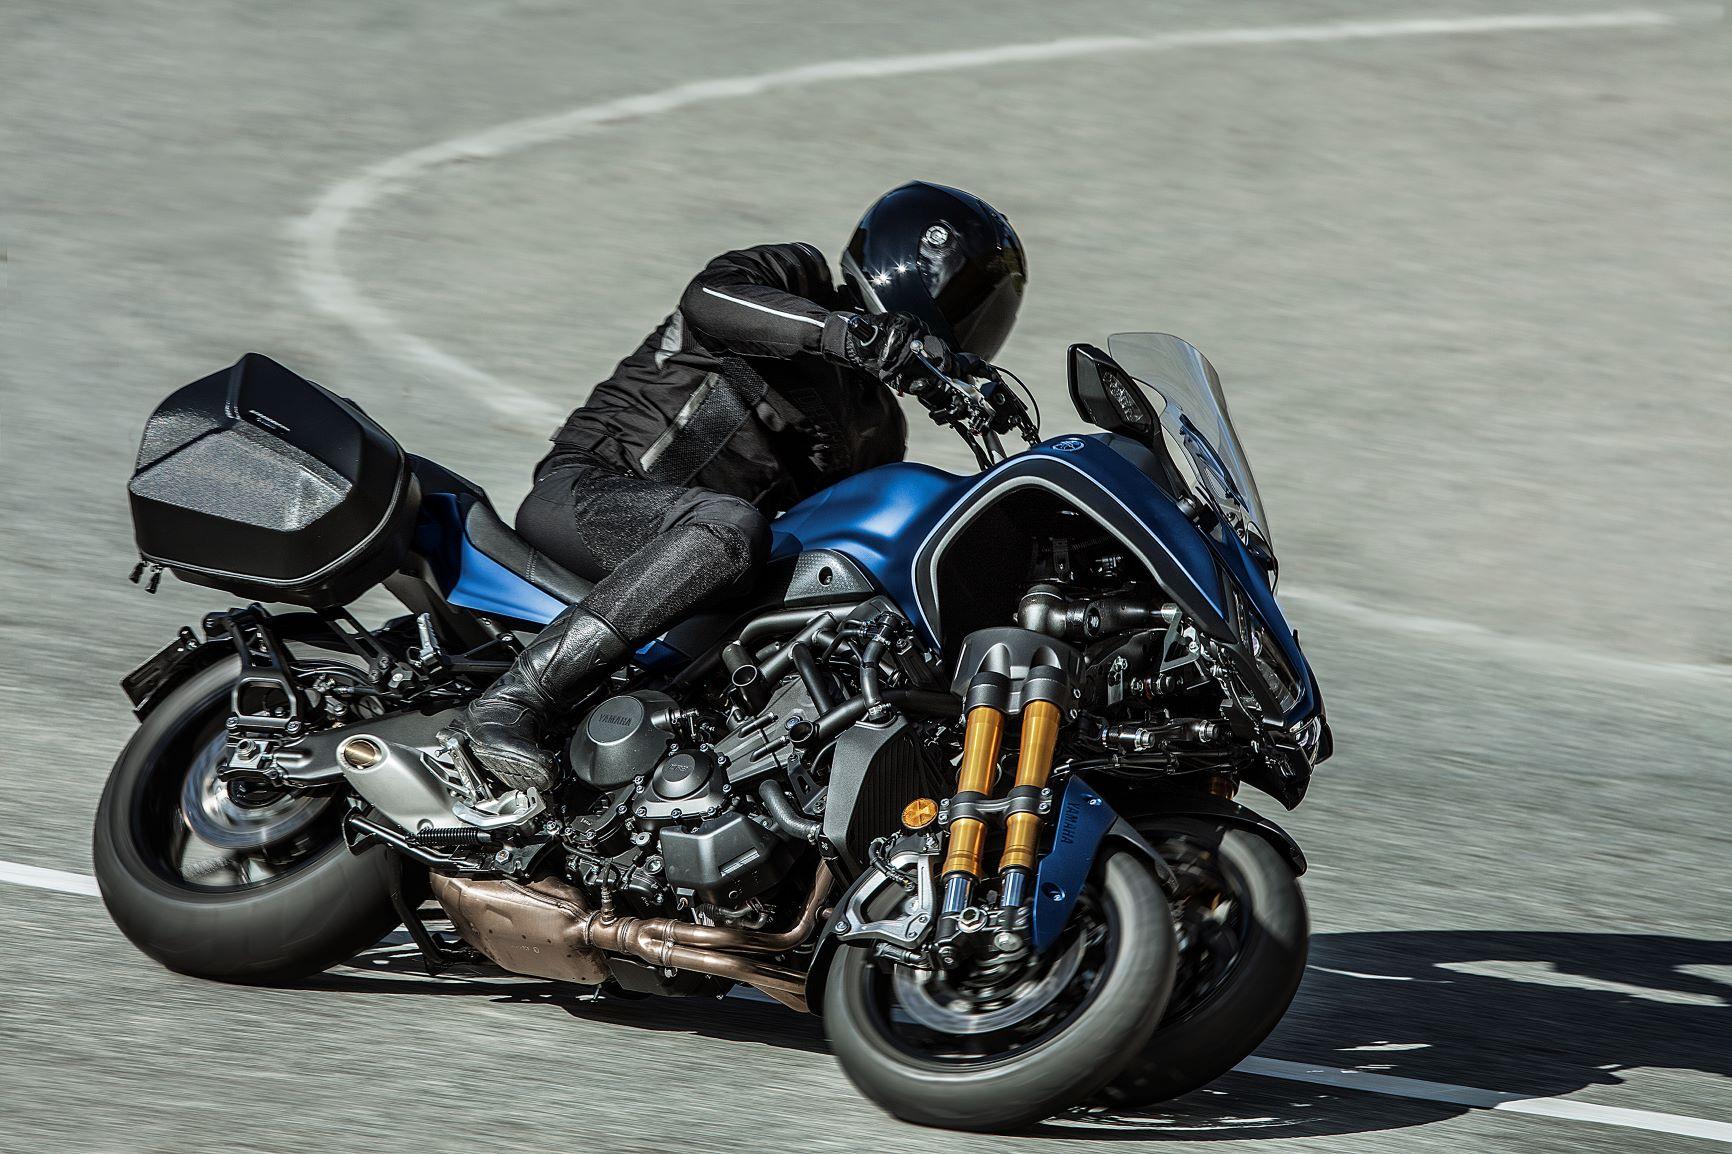 2019 Yamaha Niken GT: Quirky Three-Wheeler Gets Enhanced